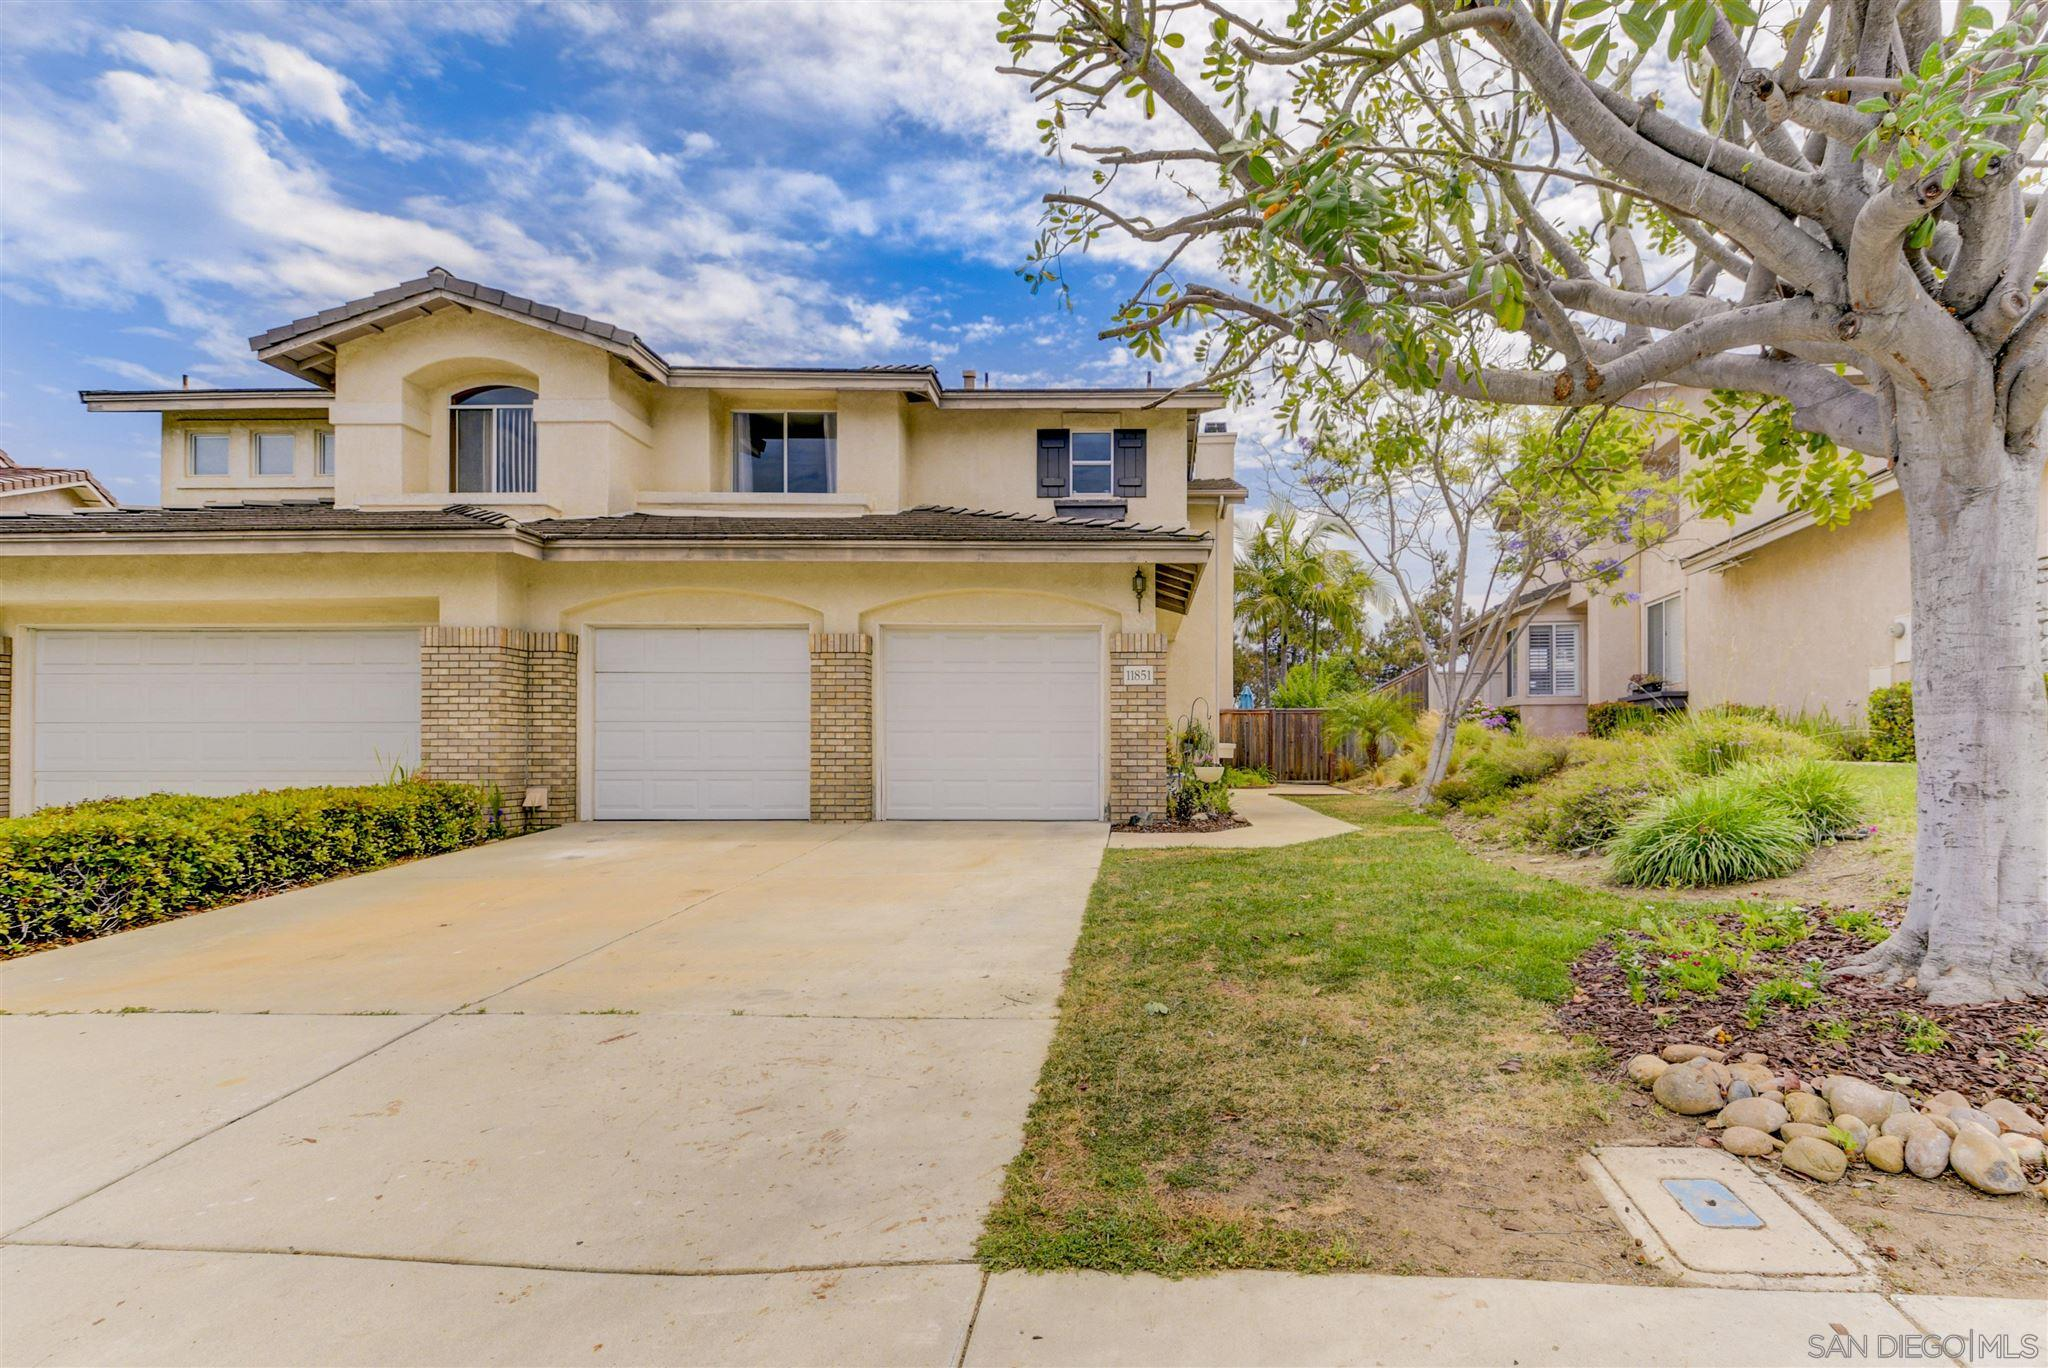 11851 Ramsdell Court, San Diego, CA 92131